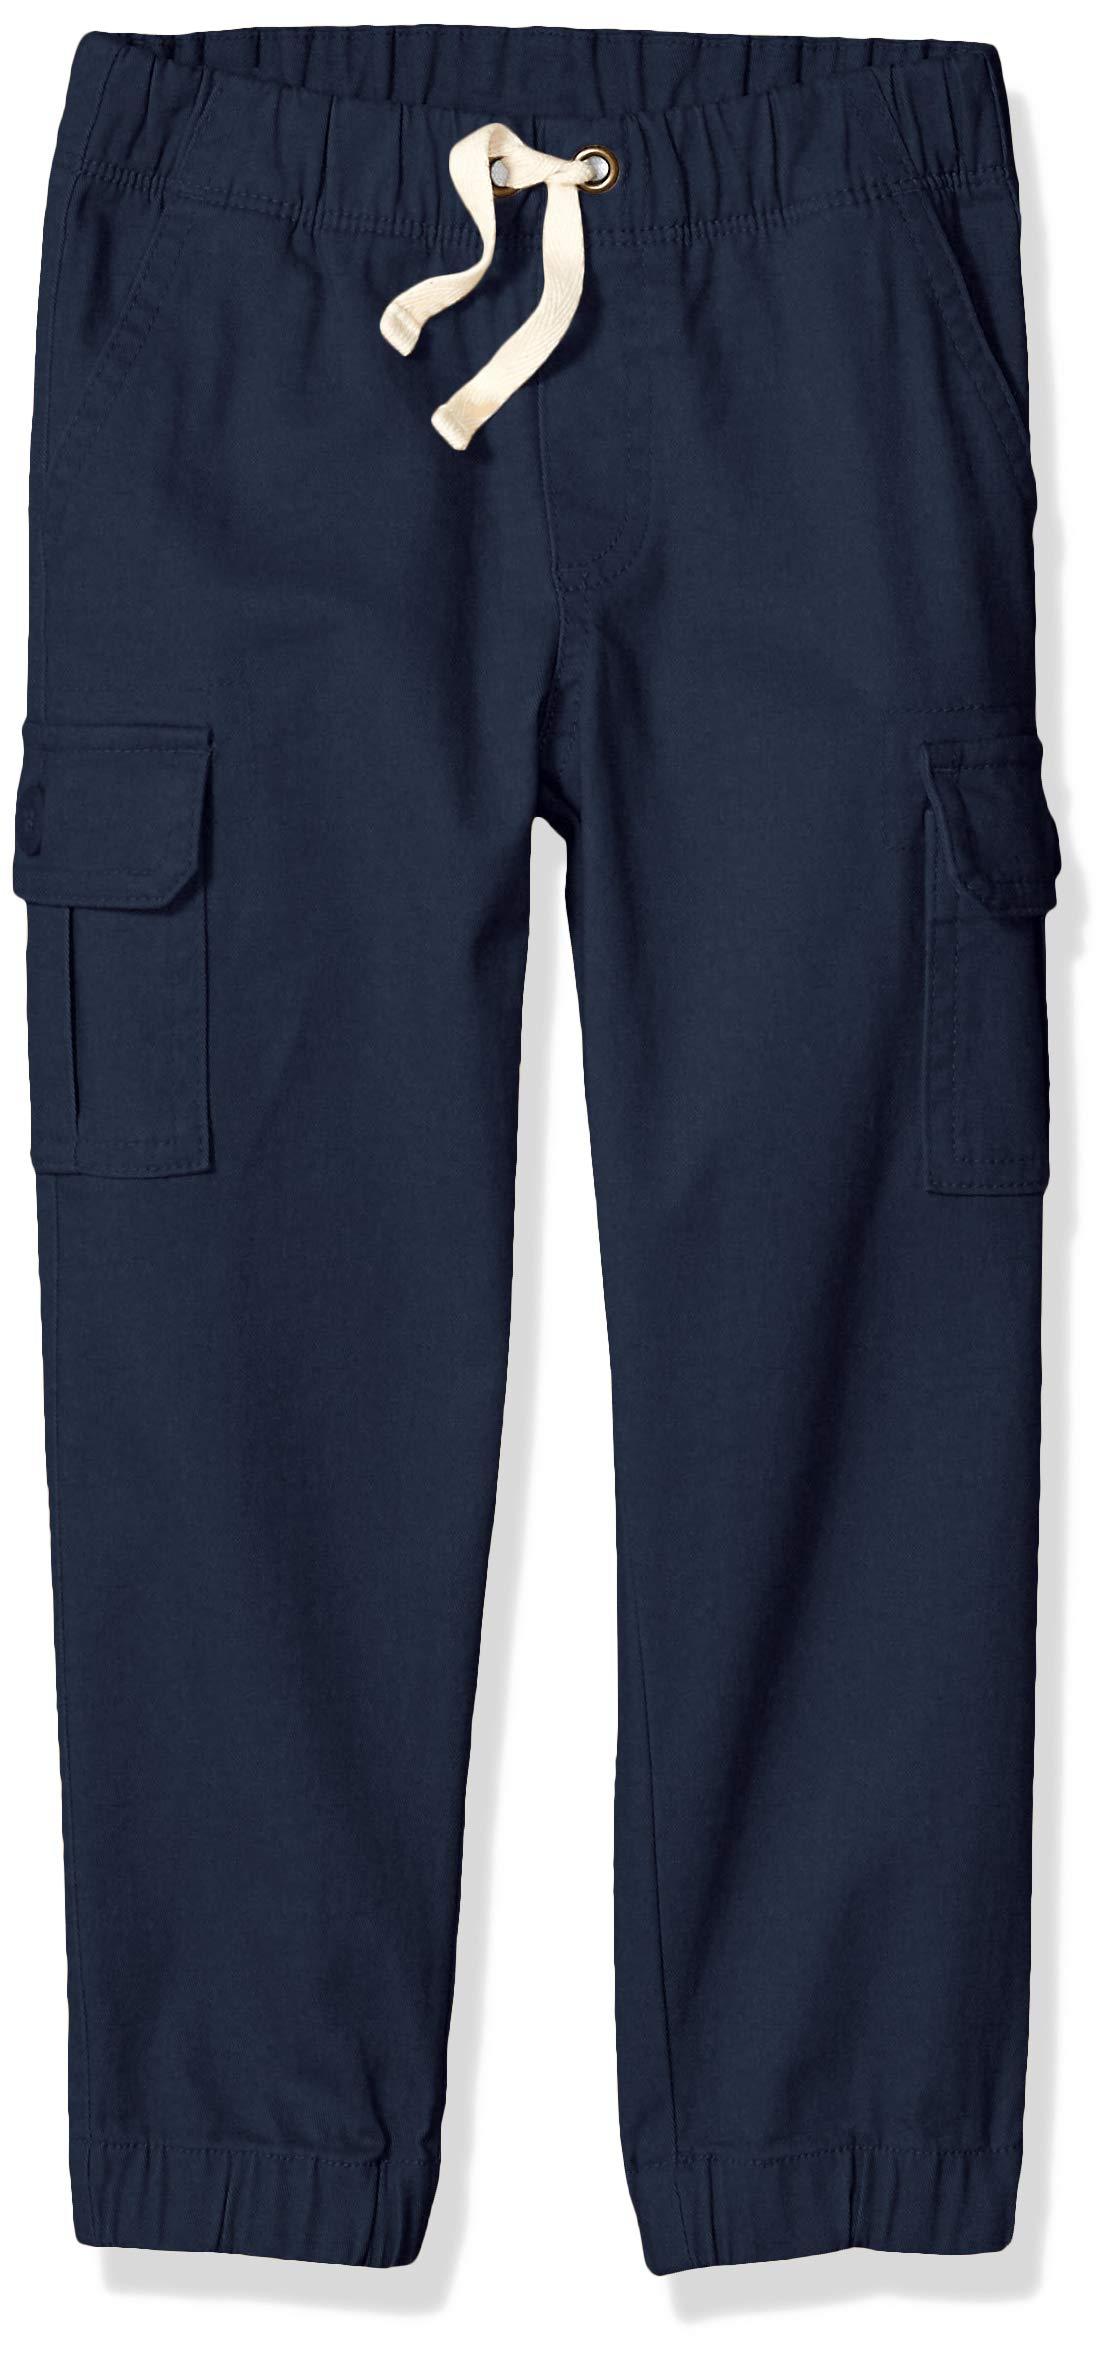 Amazon Essentials Boys' Little Cargo Pants, Navy Blazer, X-Small by Amazon Essentials